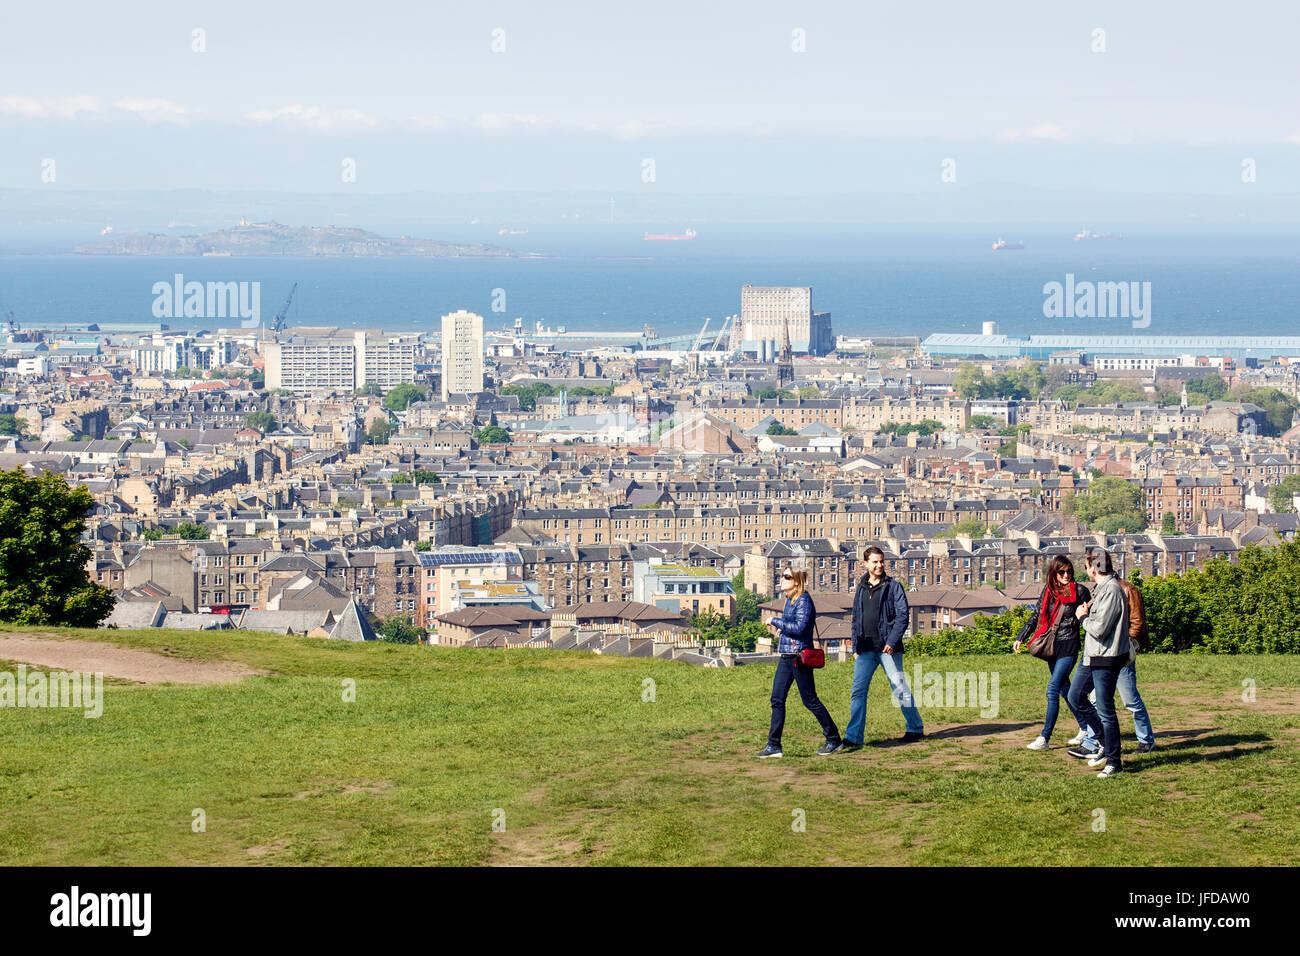 Calton Hill Edinburgh - Stock Image